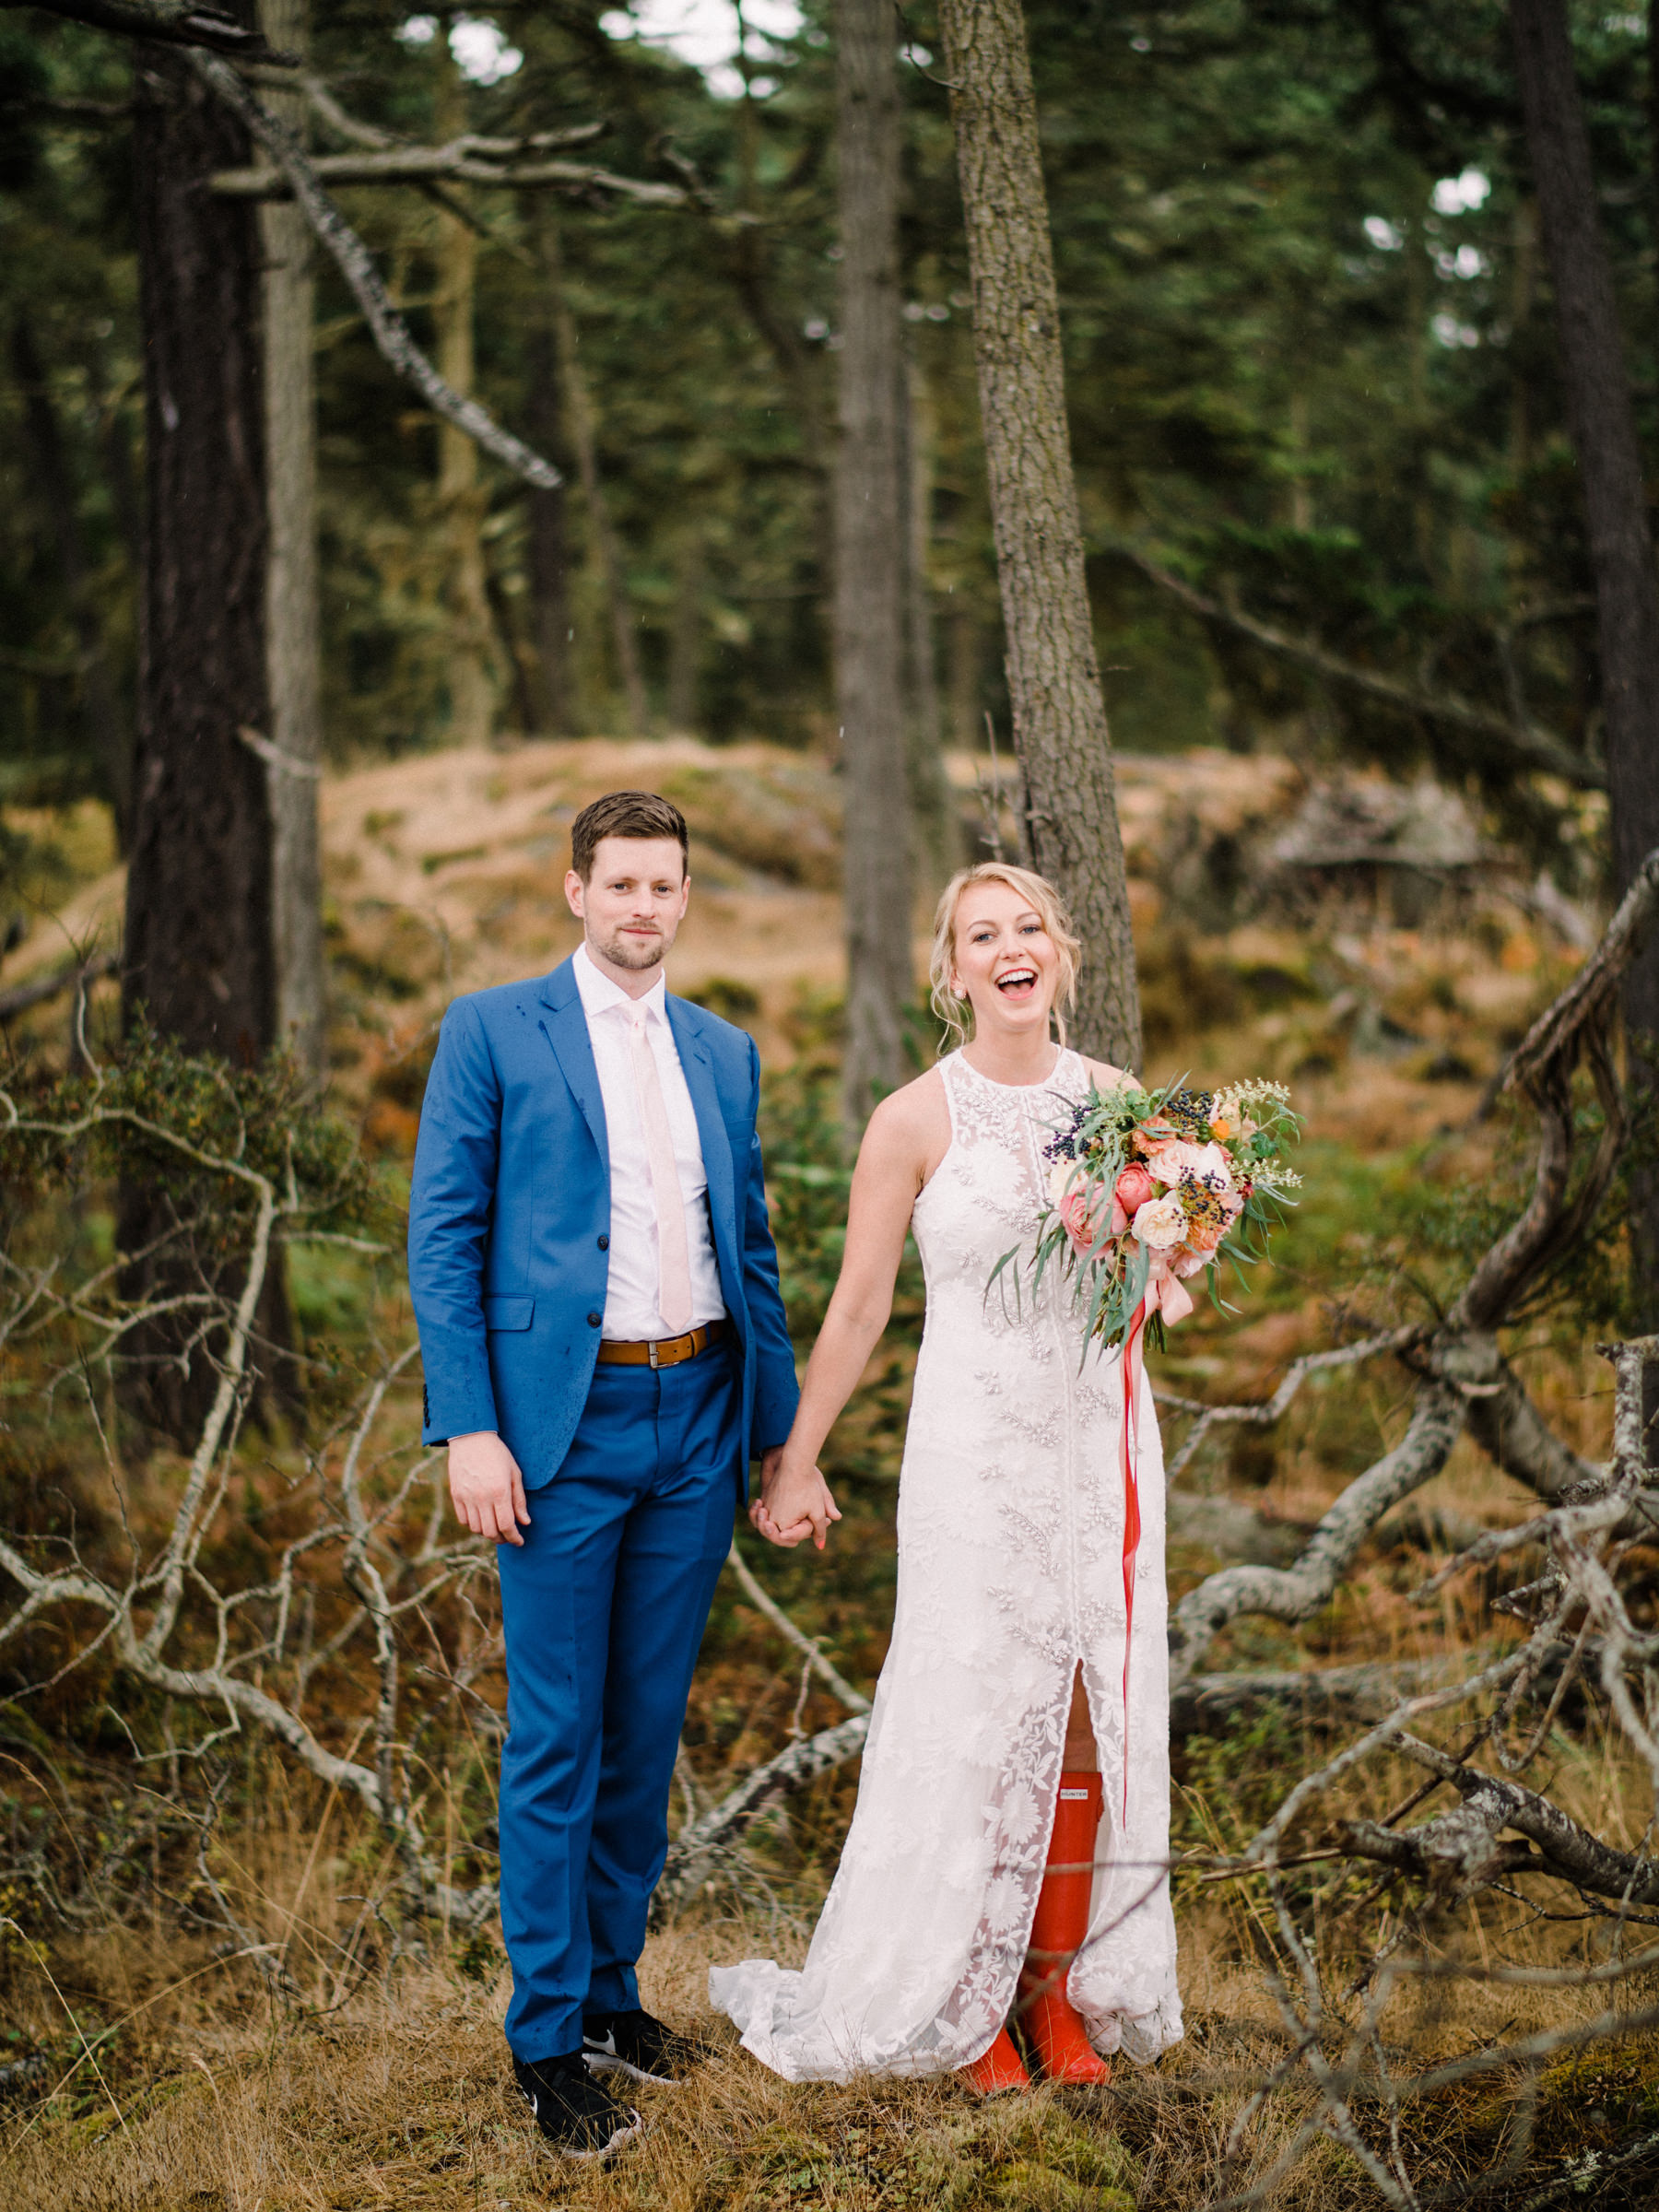 277-colorful-outdoor-lopez-island-wedding.jpg